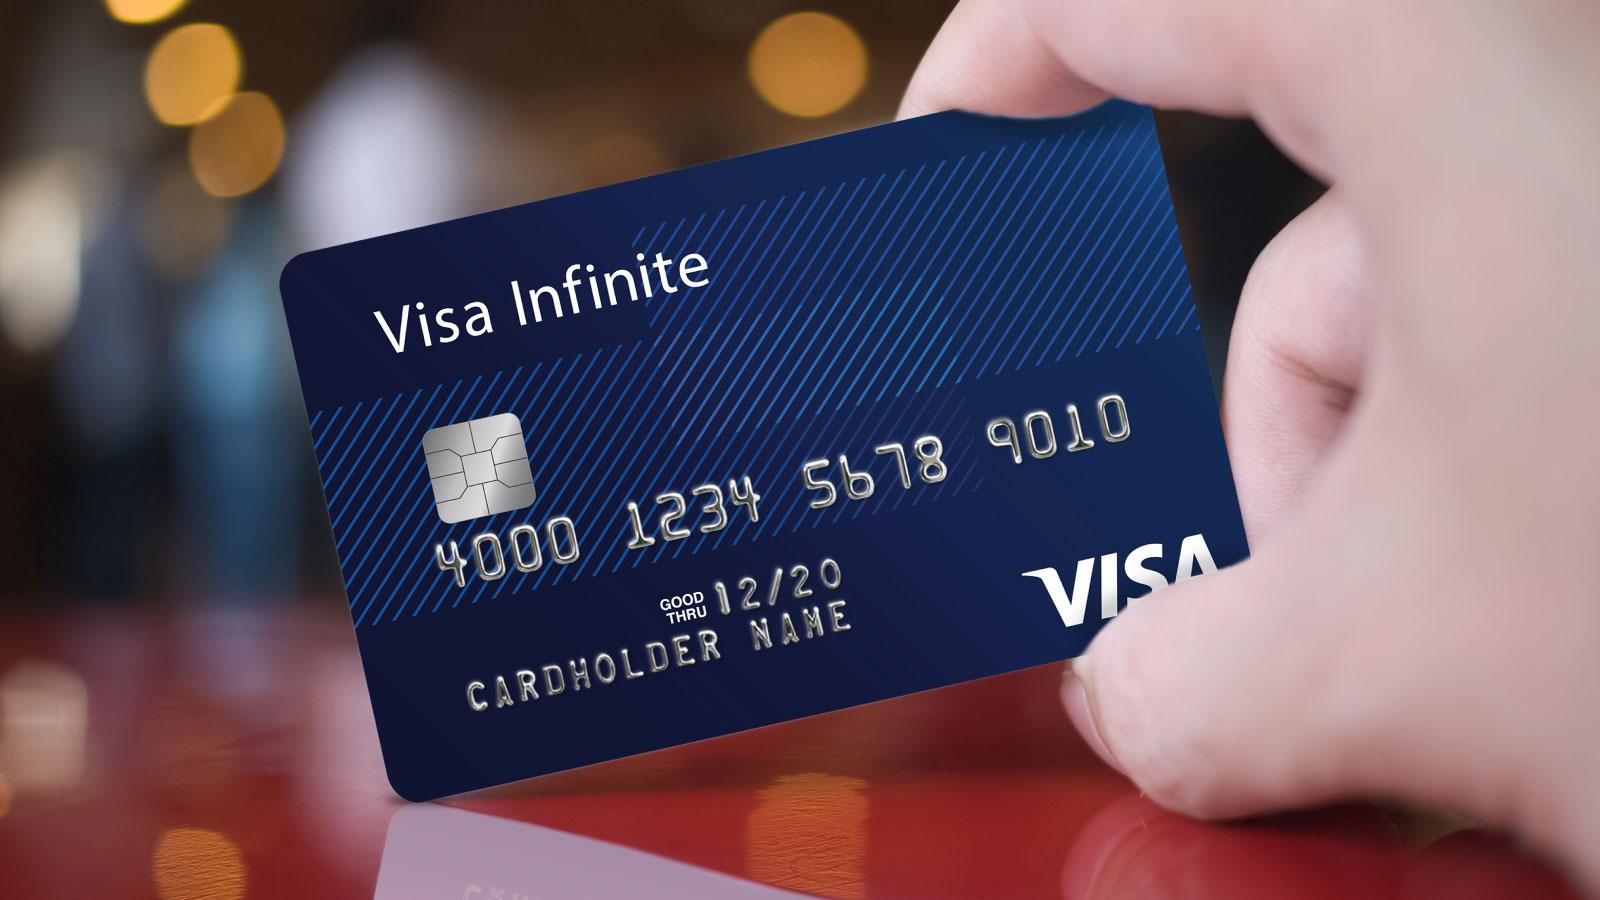 Visa Infiniteカードの特典をお楽しみください